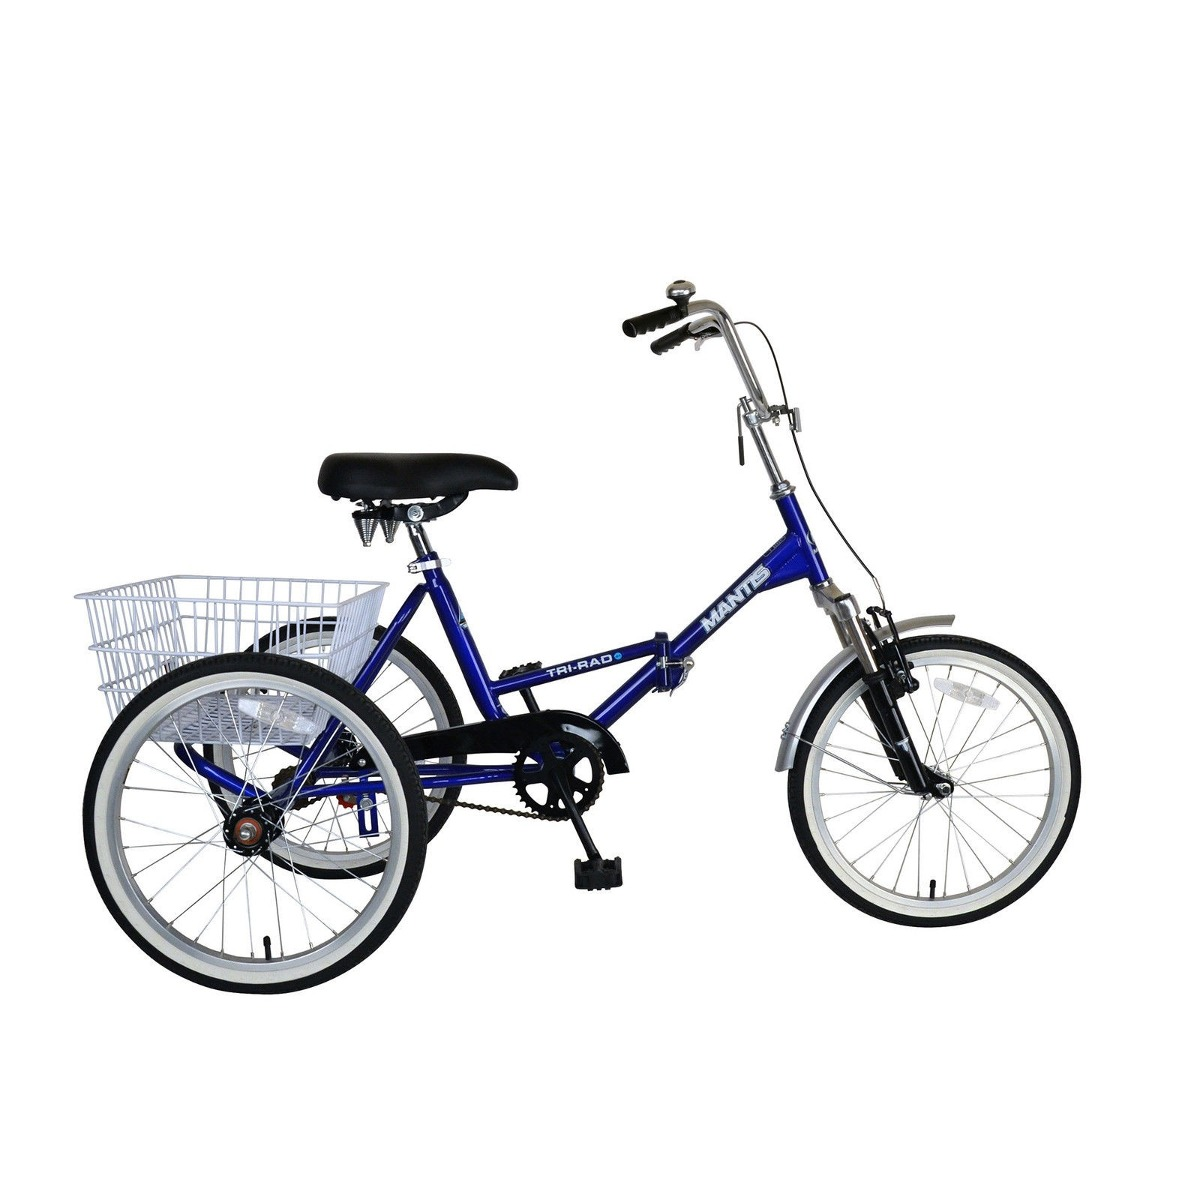 Triciclo Plegable Bicicleta Con Canasta Cycle Force